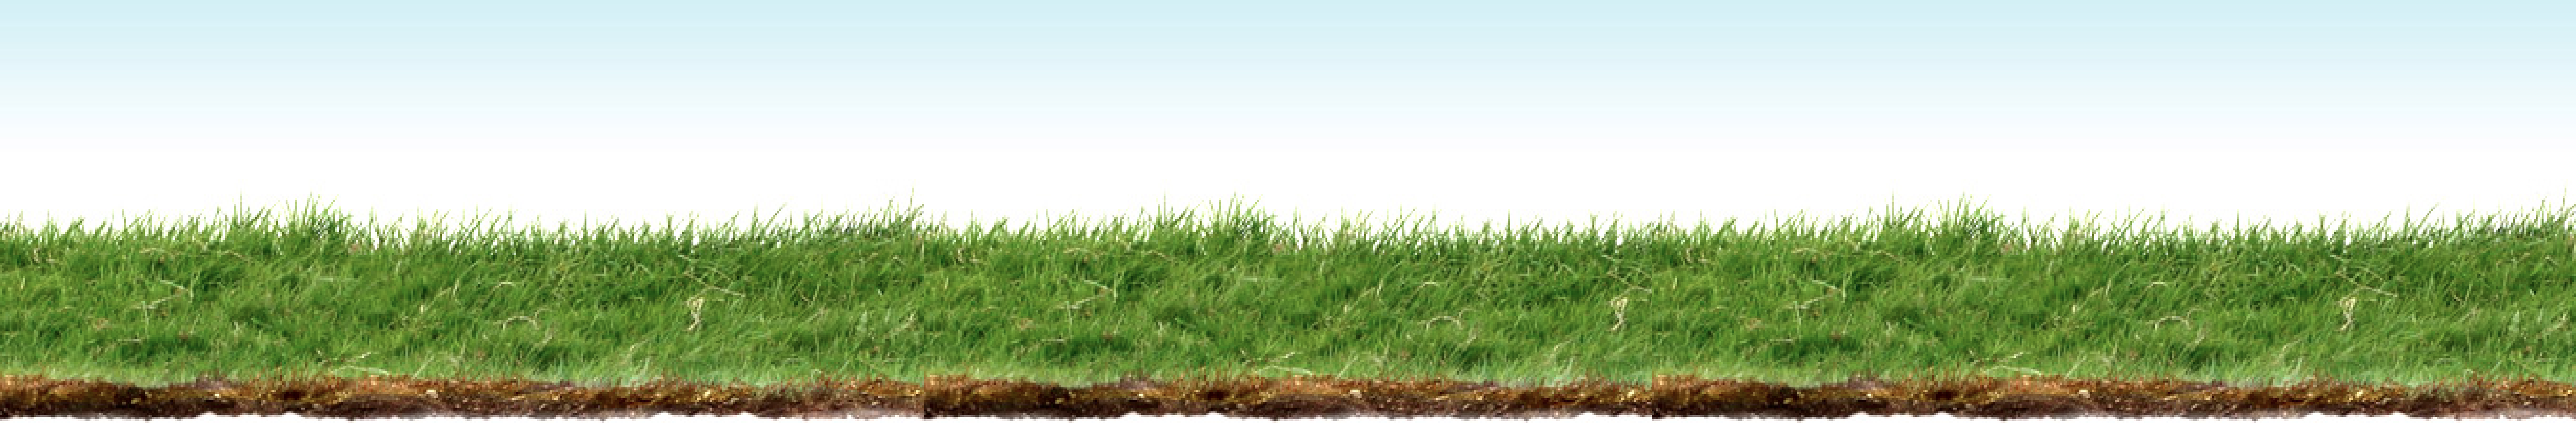 Grass Background Png Grass-background.png